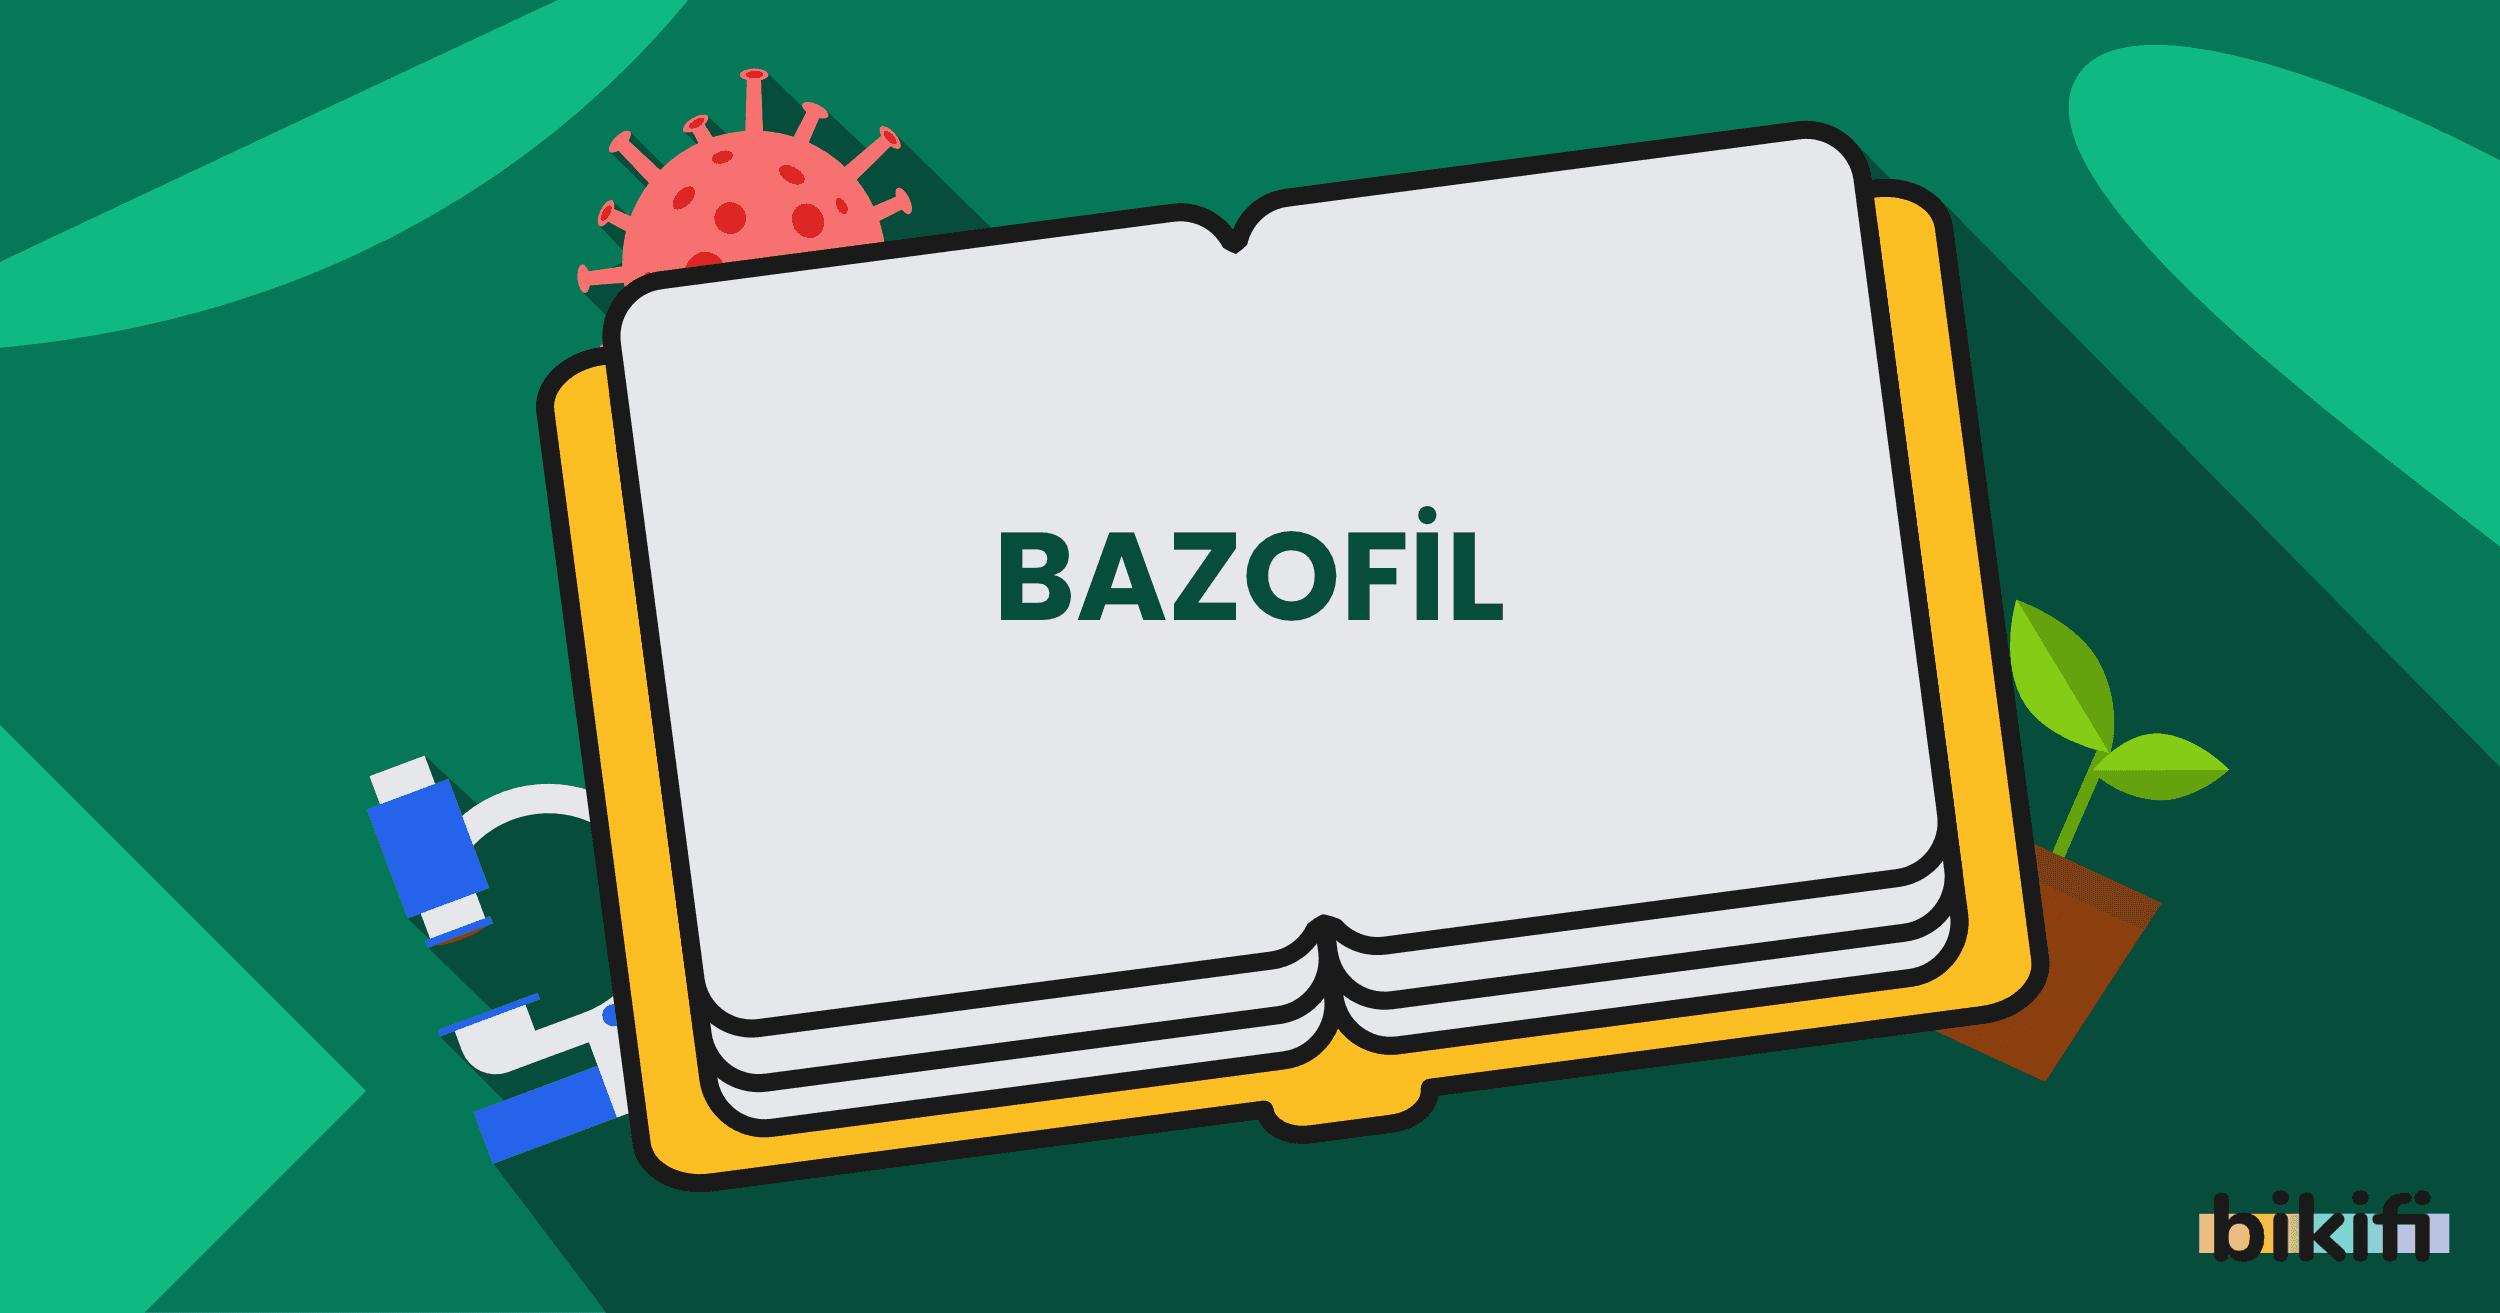 Bazofil